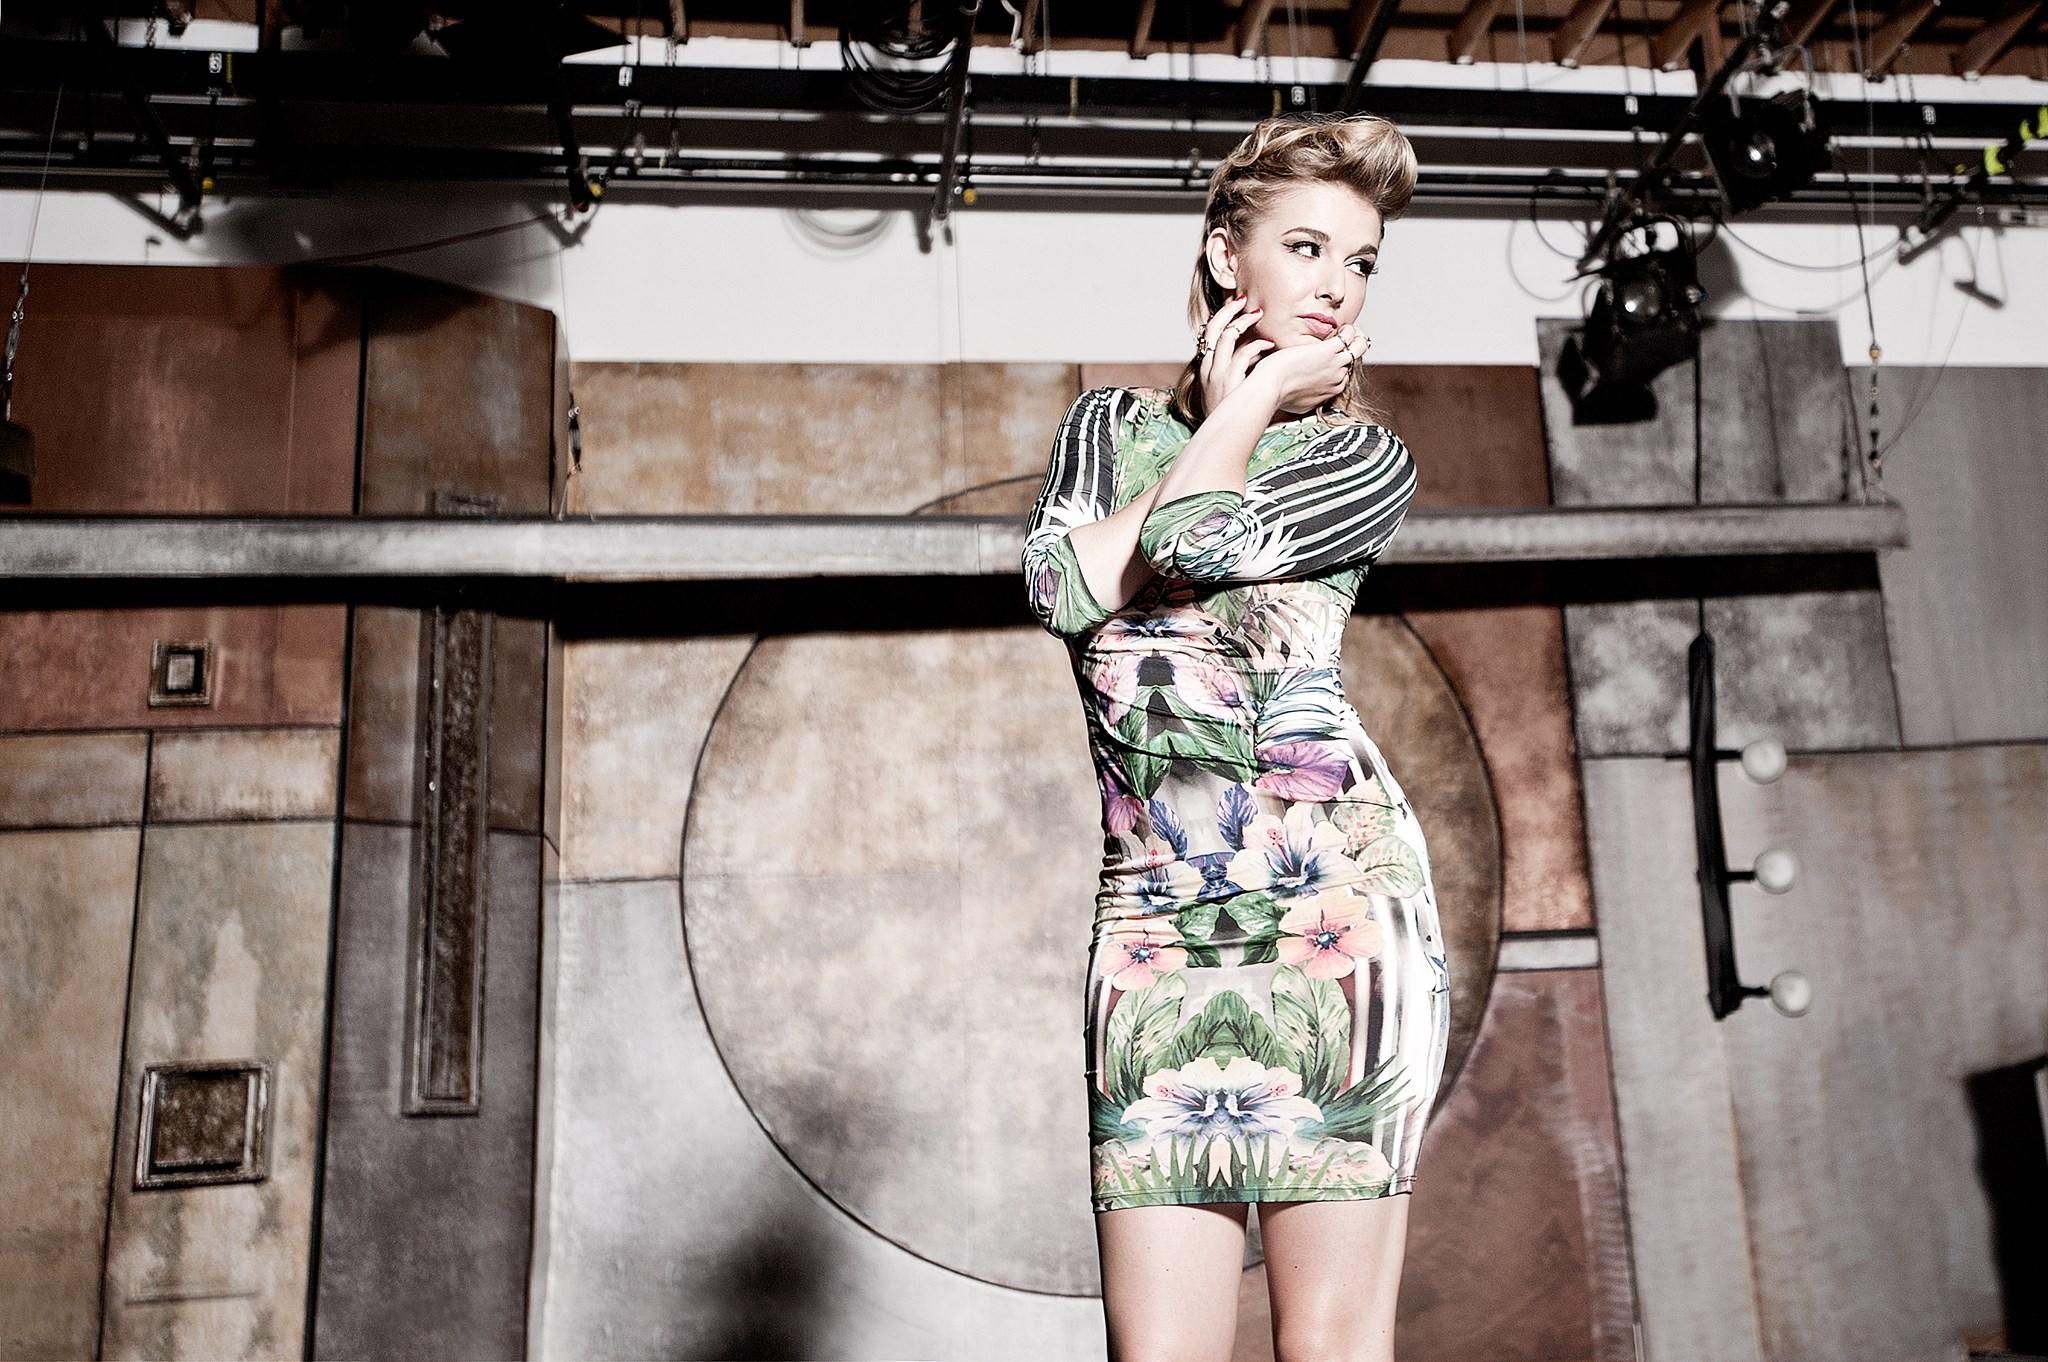 LA Girl: Singer Sarah Blaine